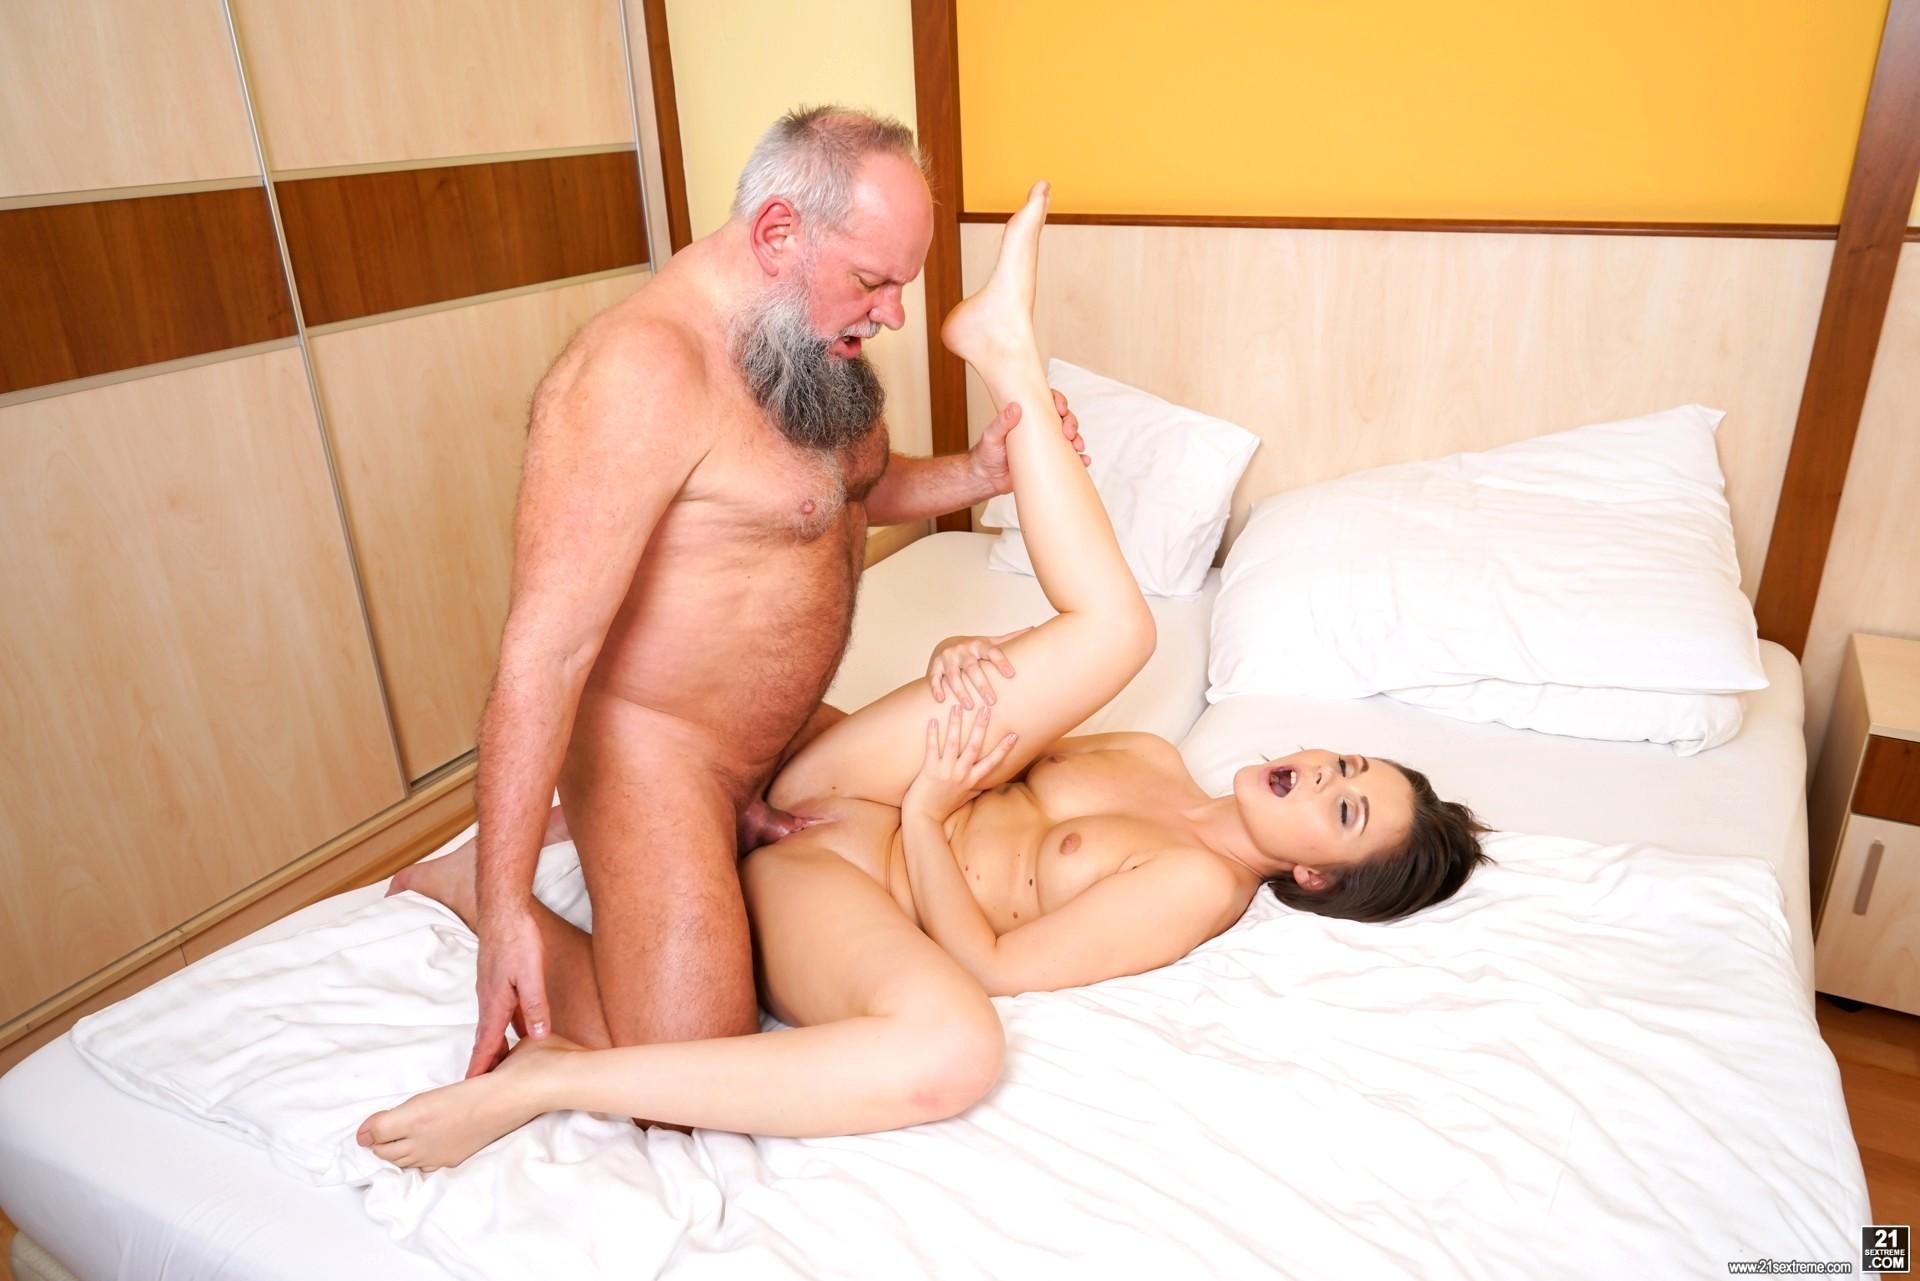 Lesben oral pussy sex